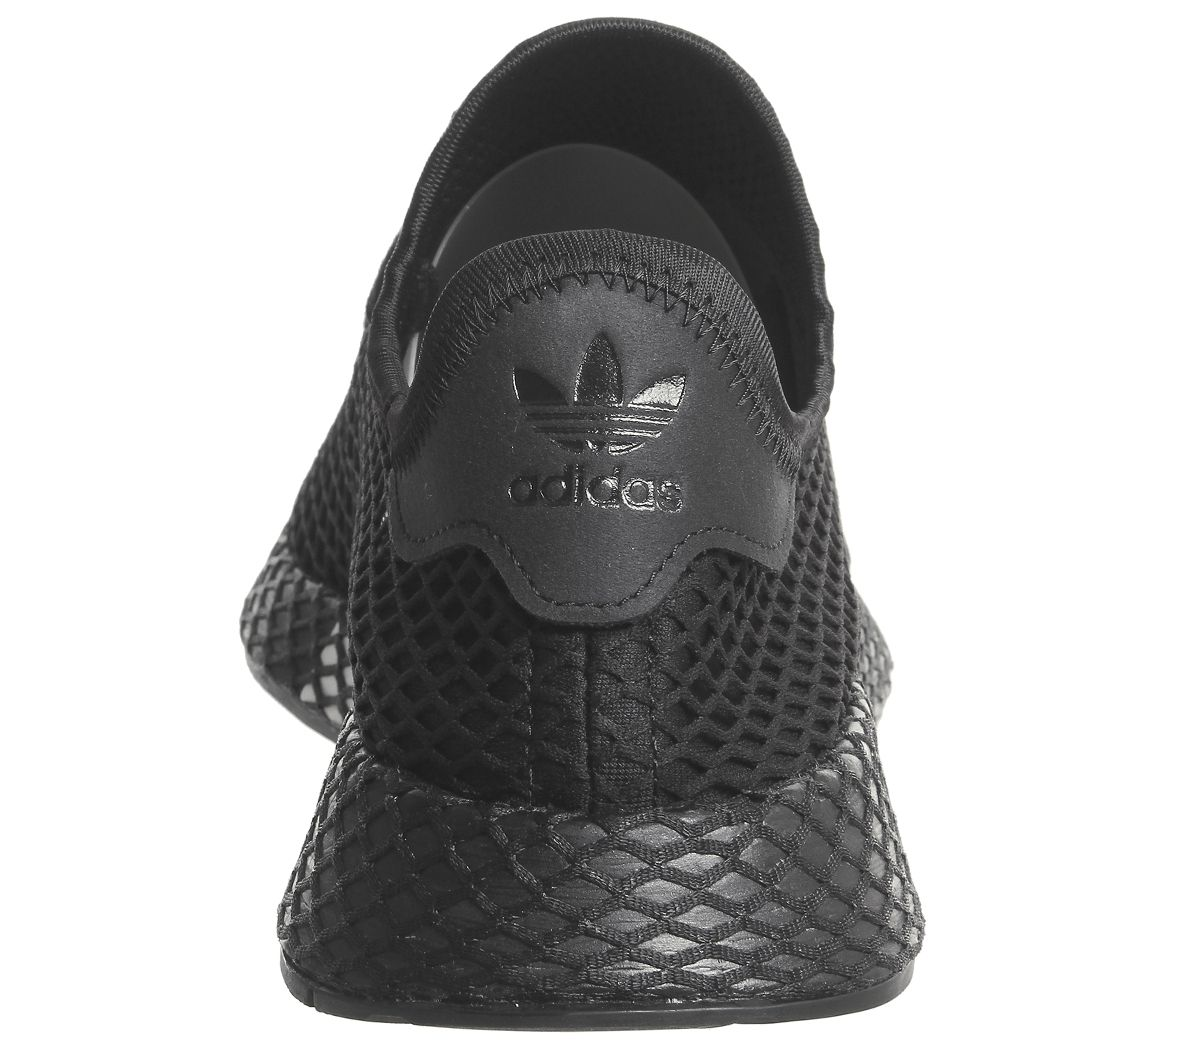 1db22144d Sentinel Mens Adidas Deerupt Trainers Core Black Core Black Trainers Shoes